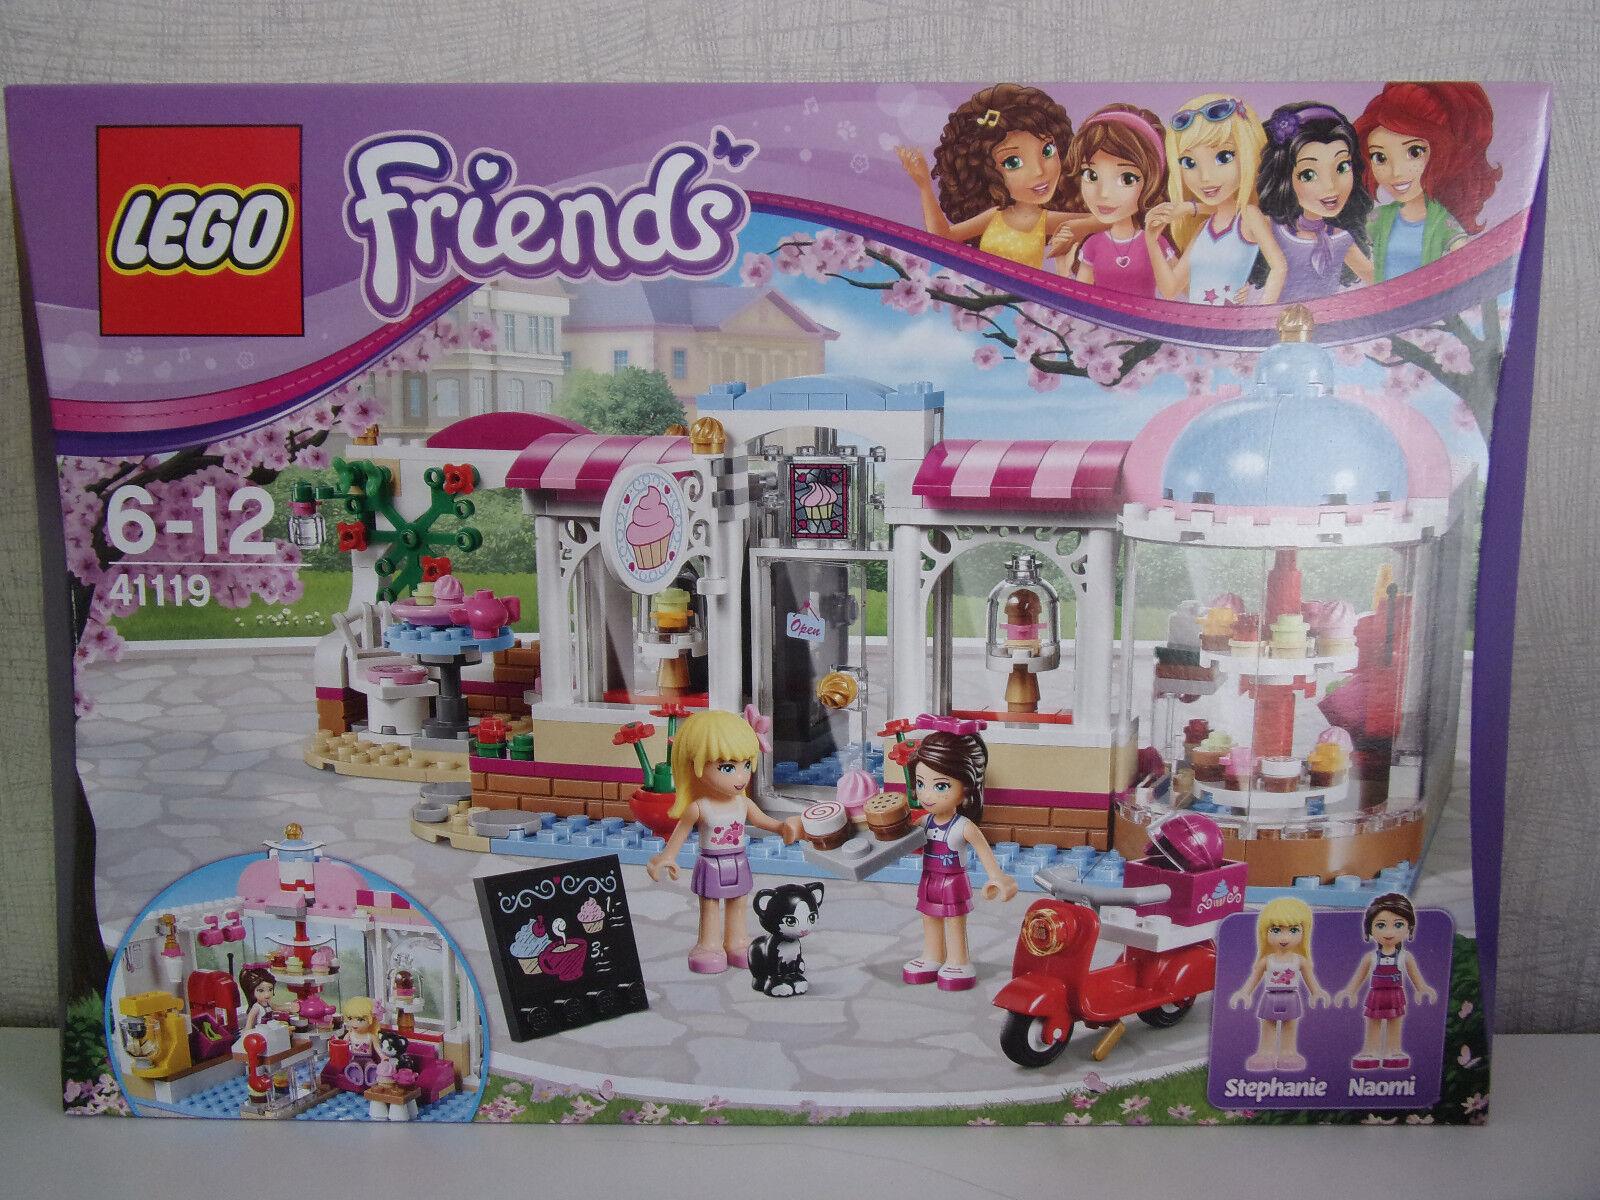 Lego Lego Lego Friends - 41119 Cupcake-Cafe - Neuf et Emballage D'Origine cf75d7